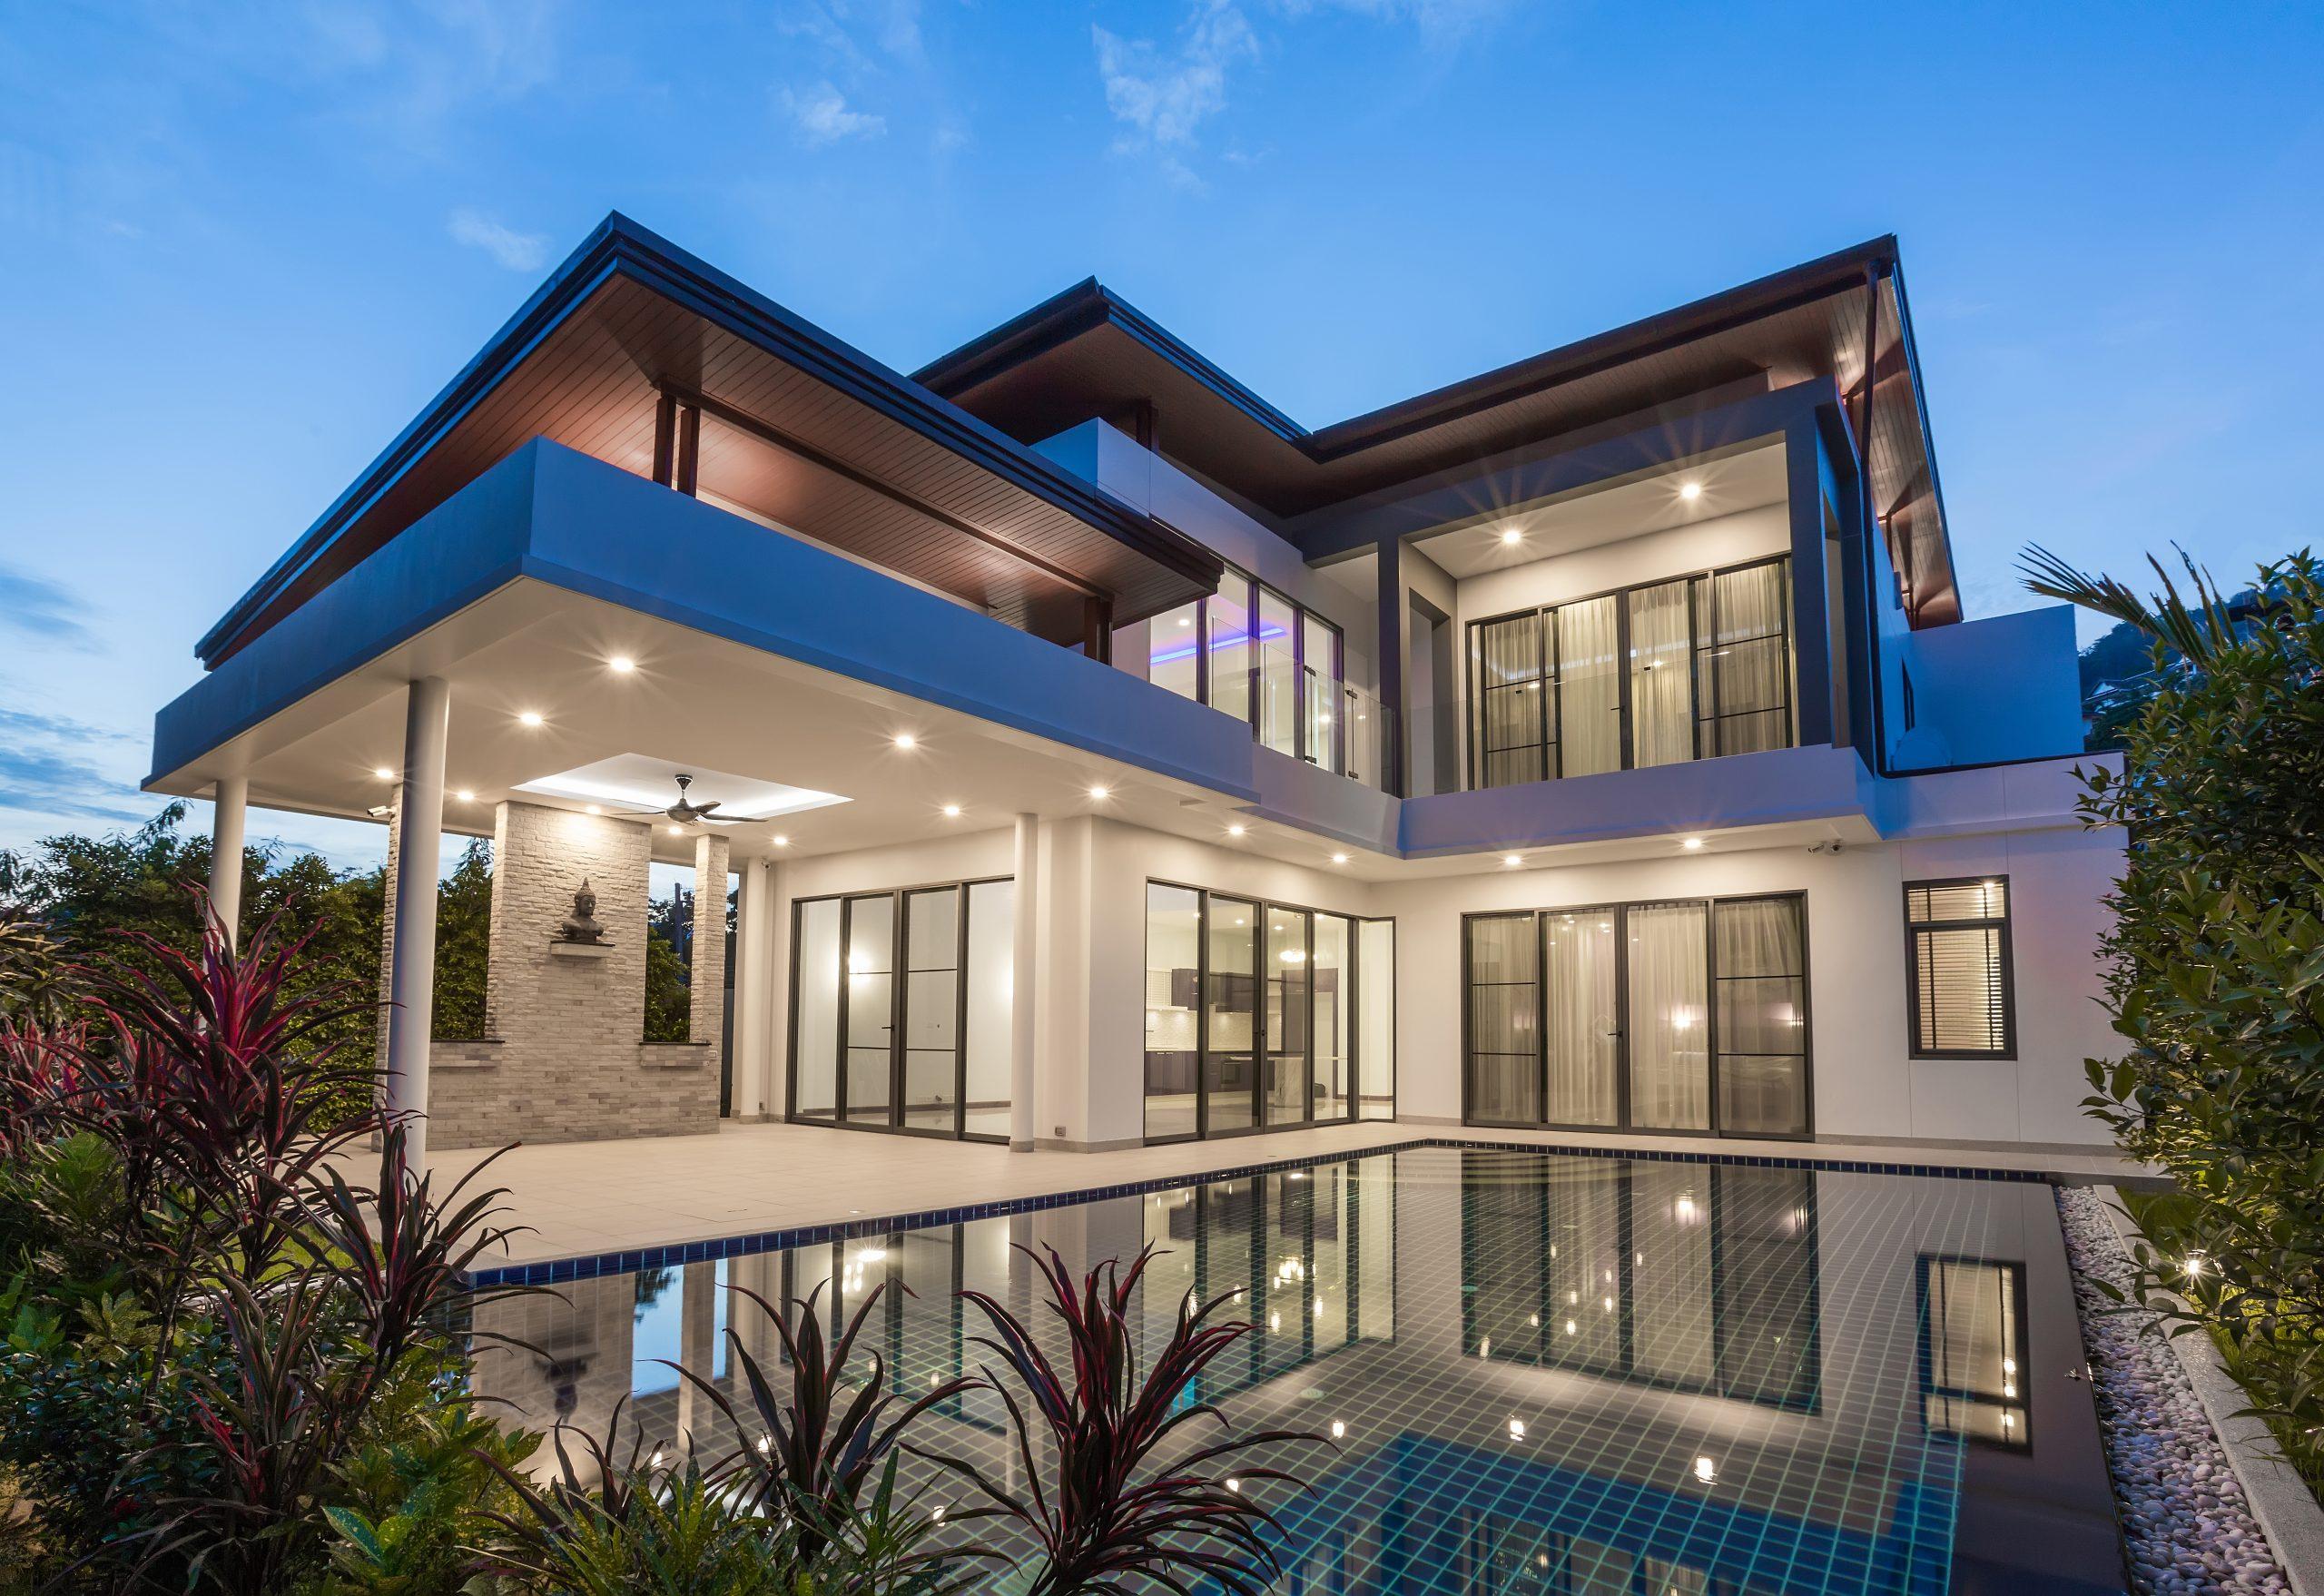 Modern,Luxury,Villa,With,Swimming,Pool